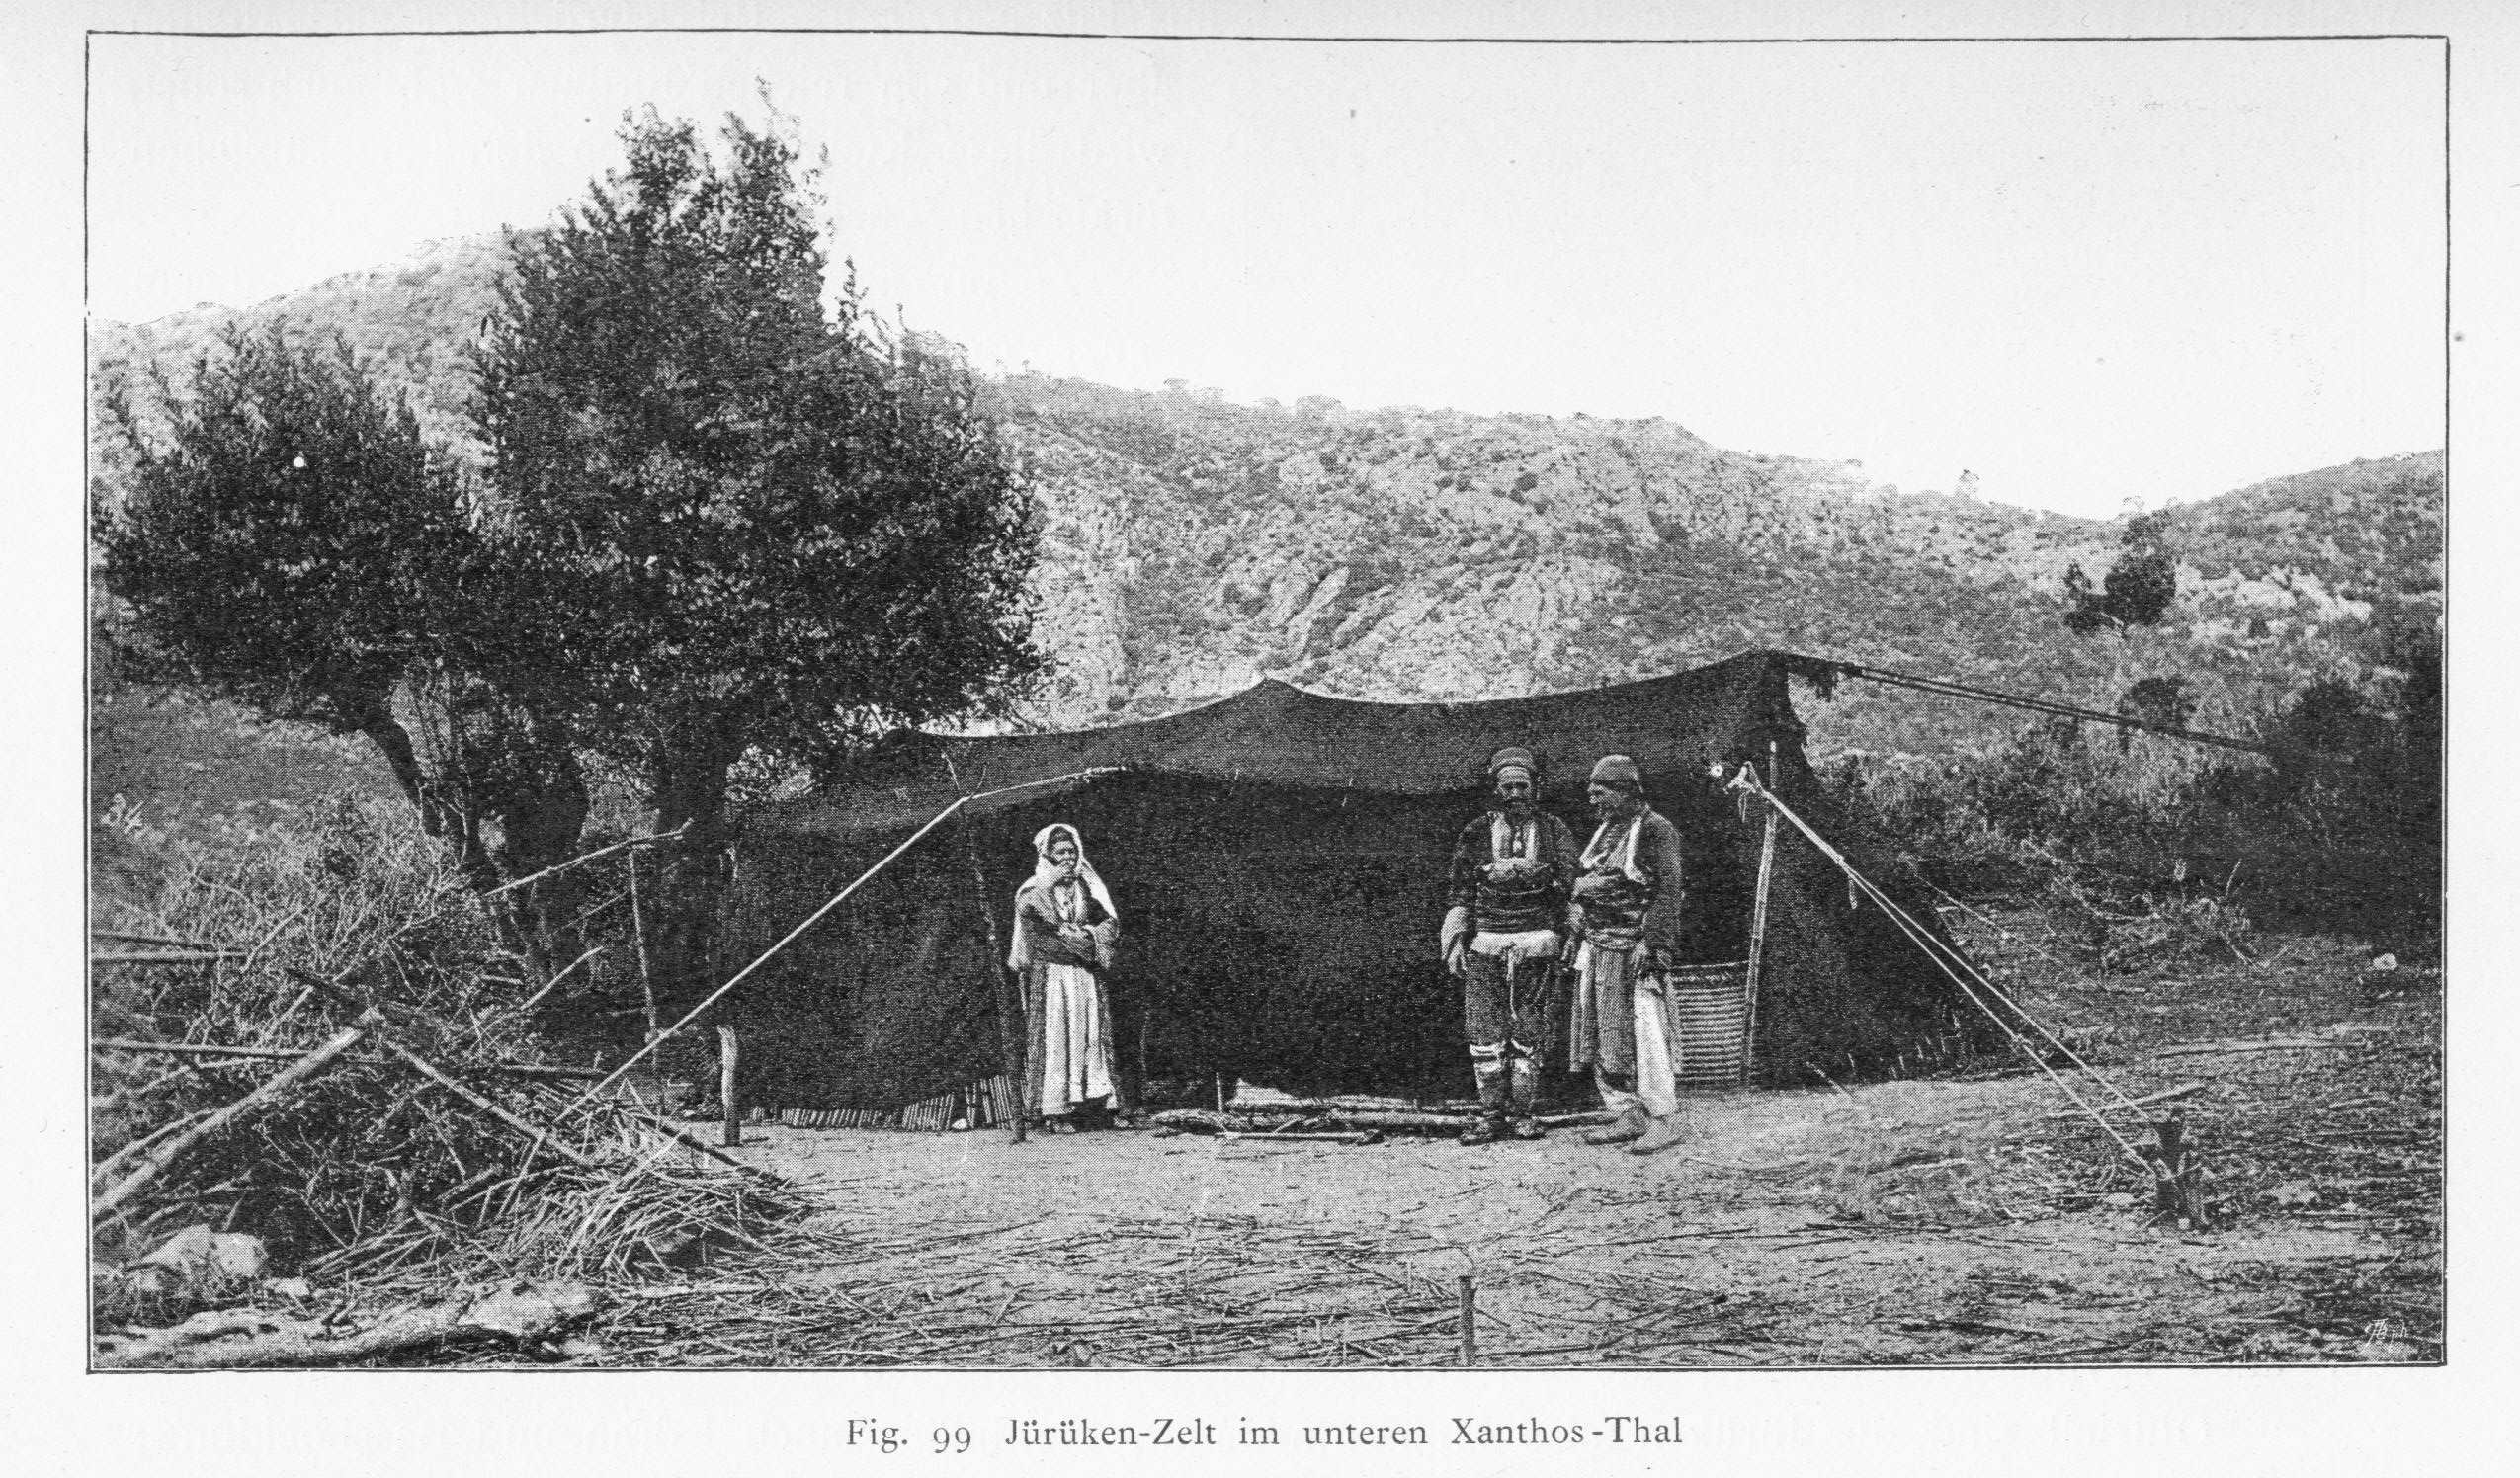 Anatolian Turkmen Black Tent, Xanthos, Sout-Western Turkey, Thal Von Luschan 1889